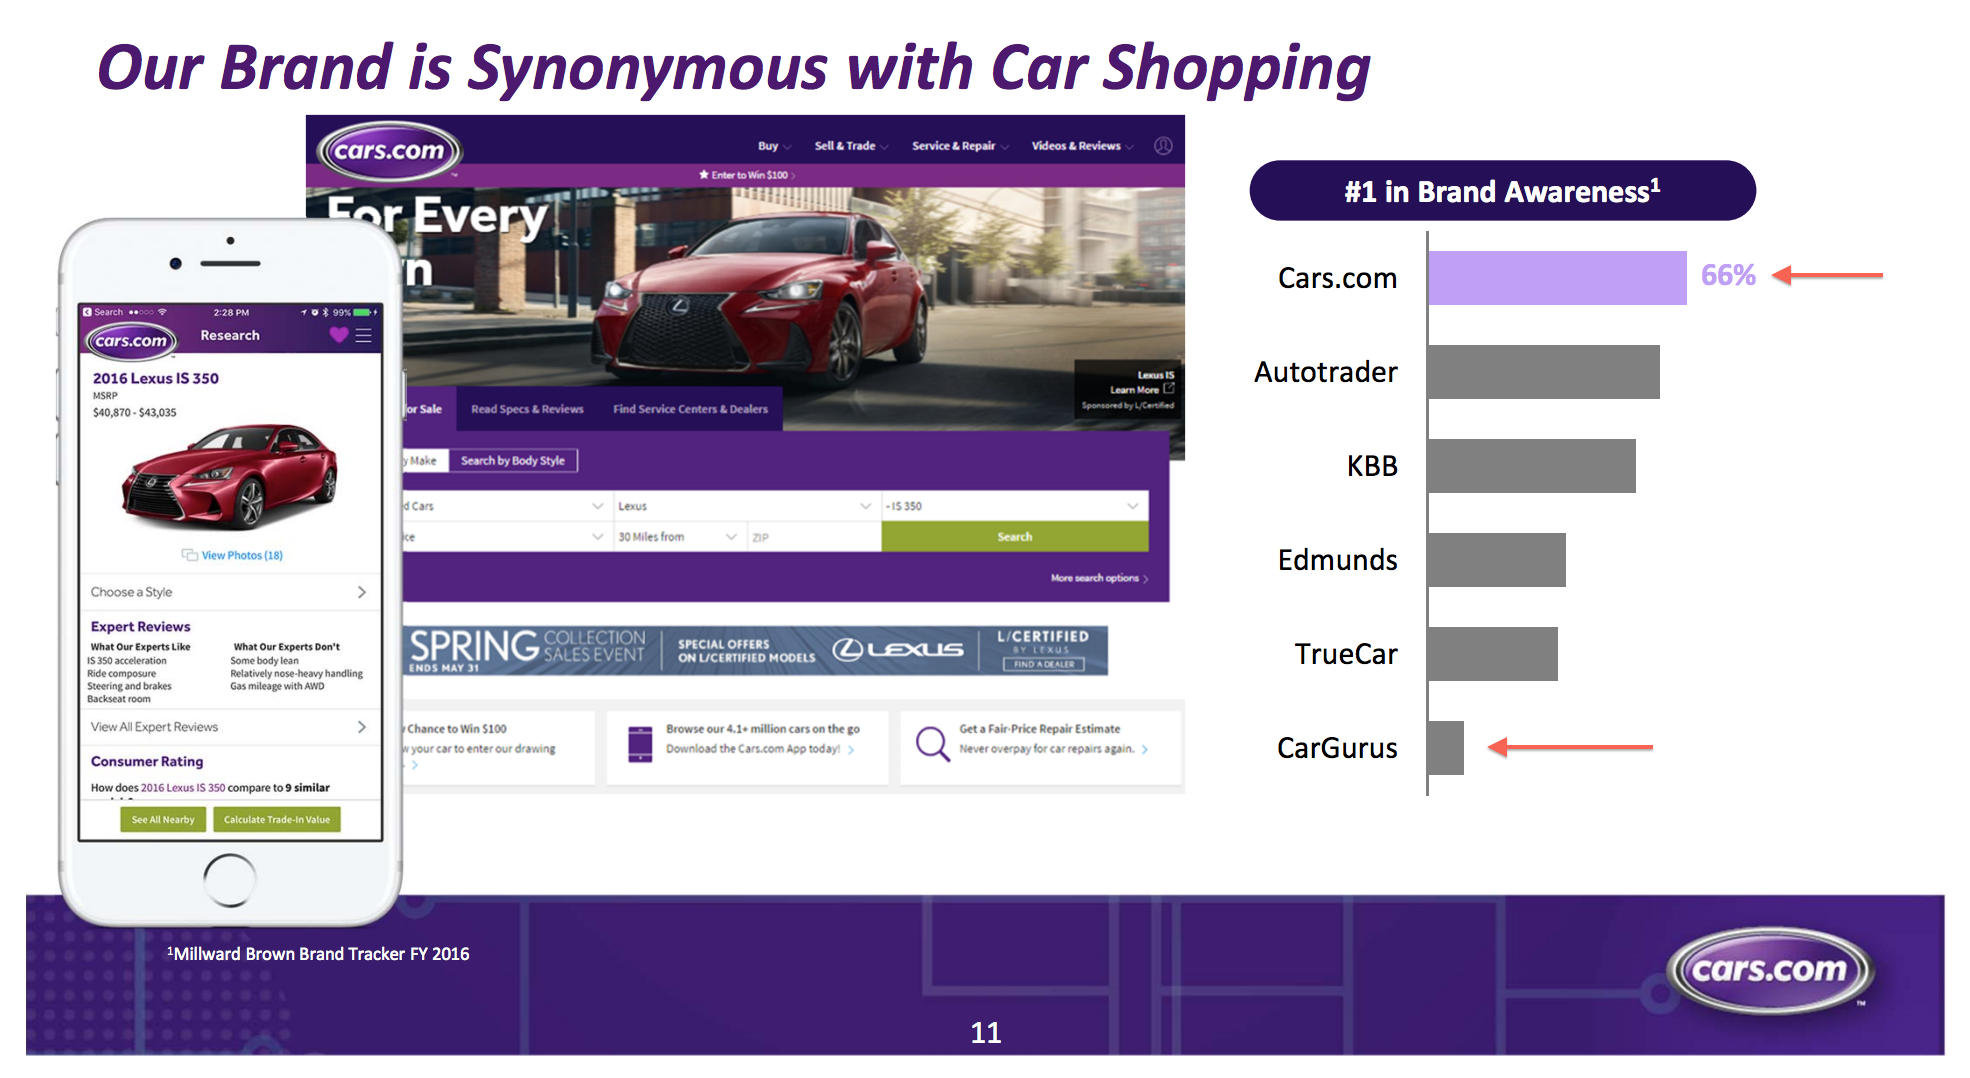 CarGurus Vs. Cars.Com - The Ultimate Growth Vs. Value Story ...